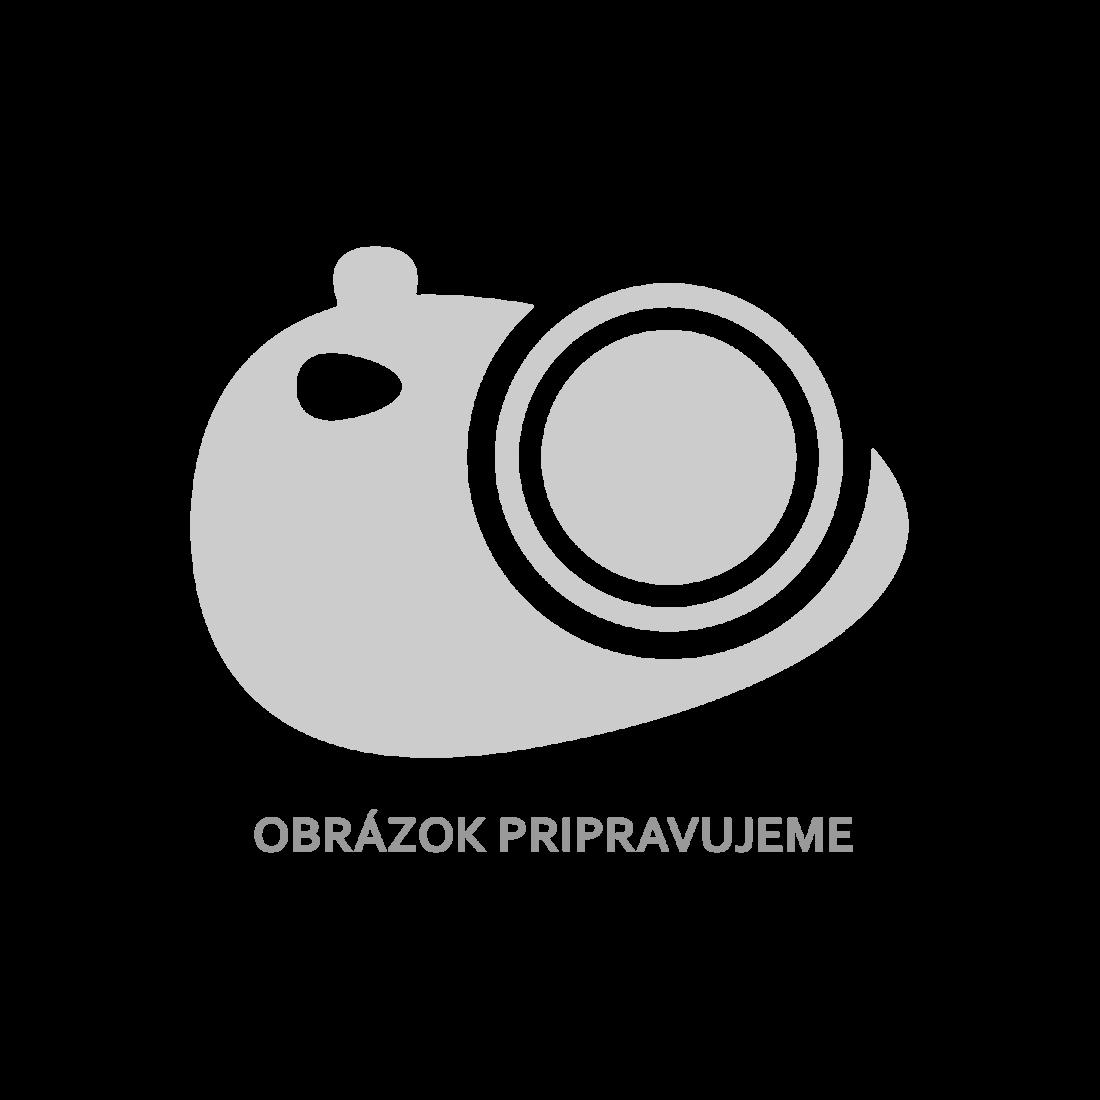 vidaXL Taburet tkaný design barevný 45 x 45 x 45 cm bavlna [287585]